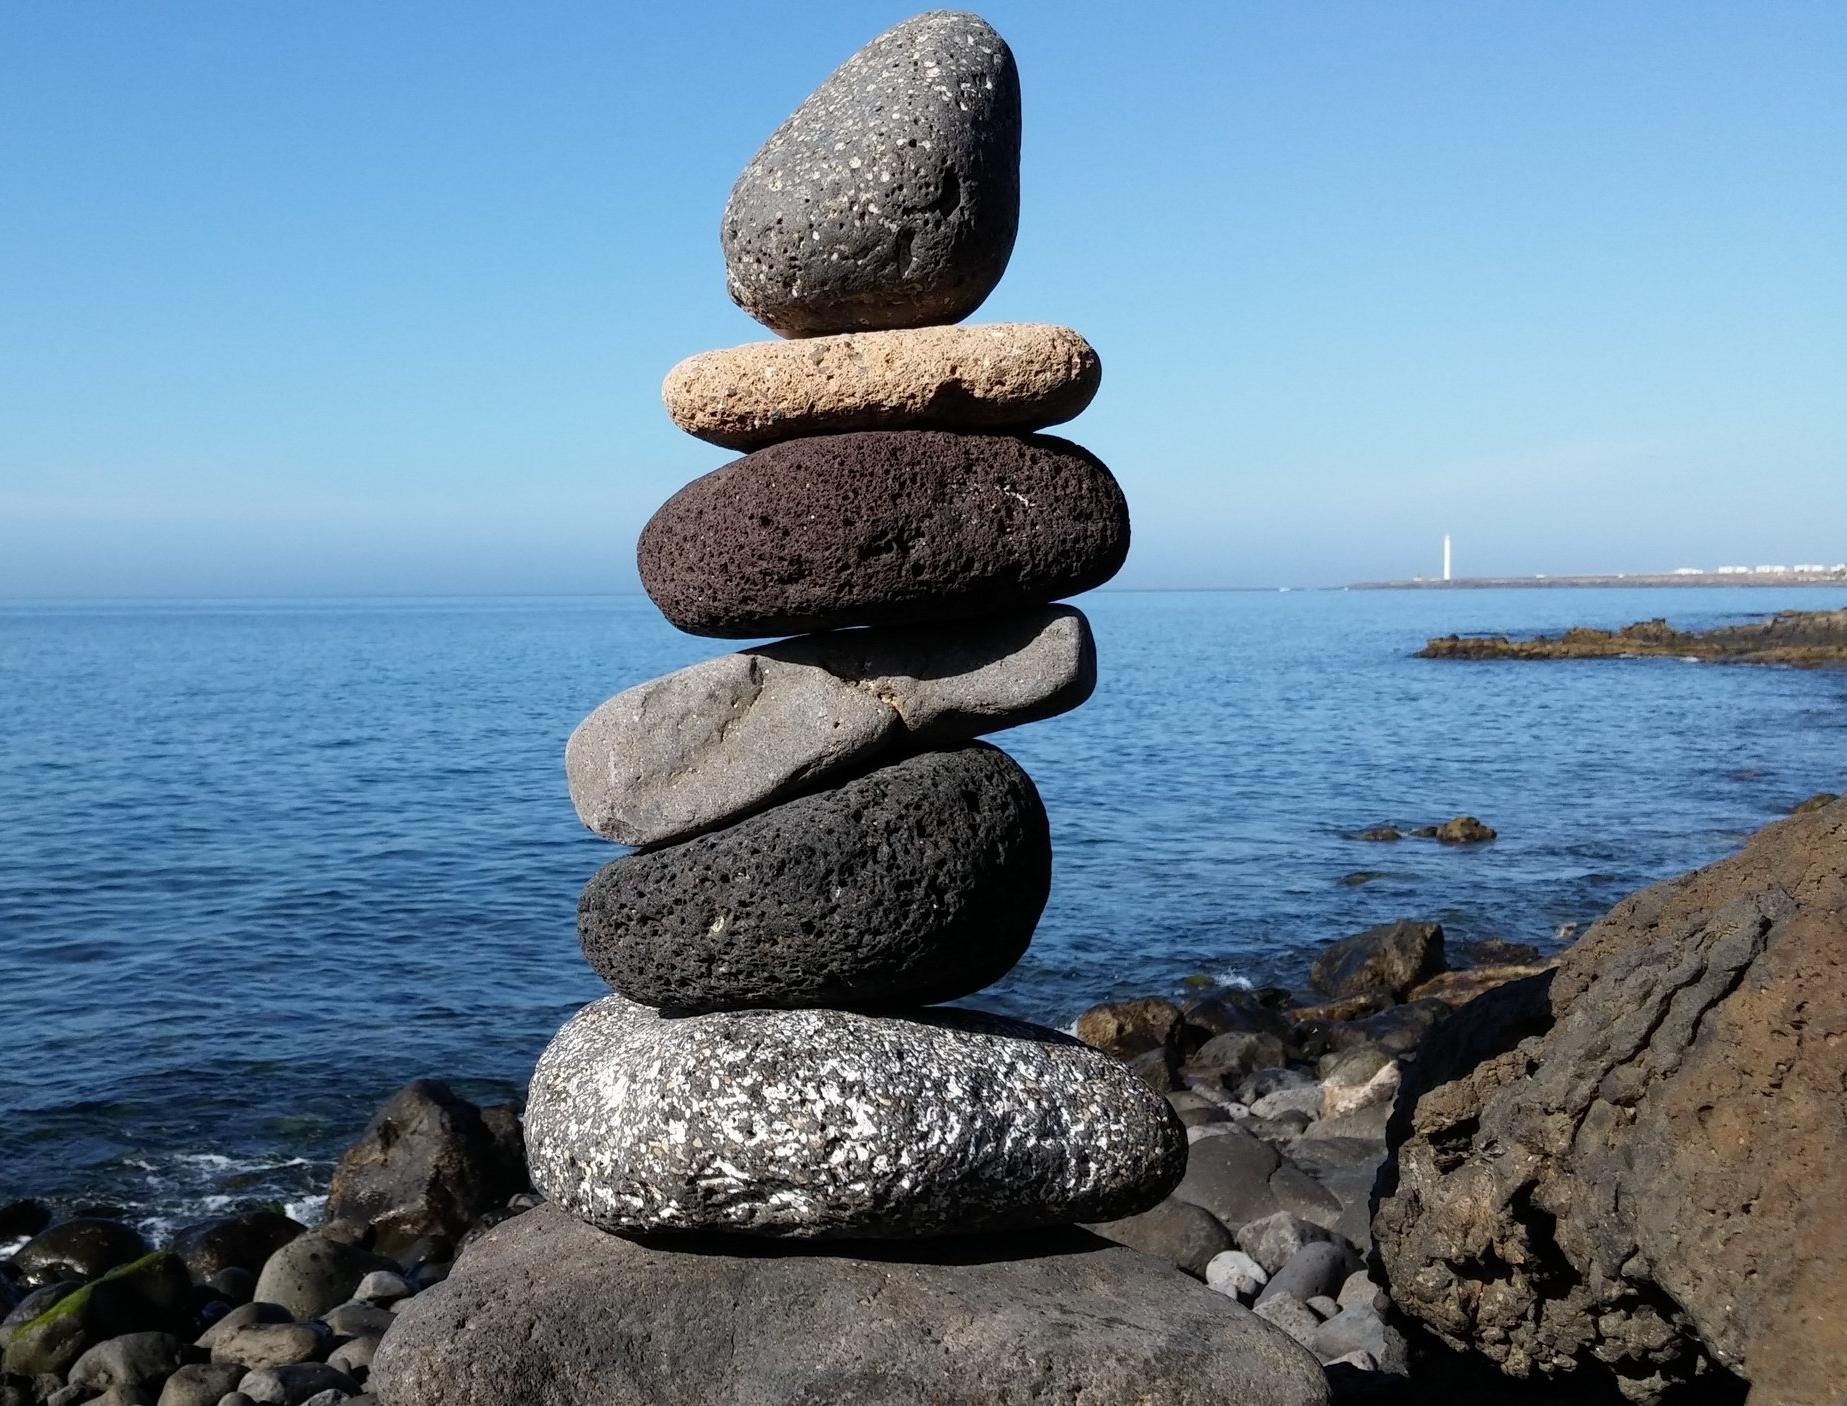 beach-sea-coast-sand-rock-ocean-547043-pxhere.com.jpg